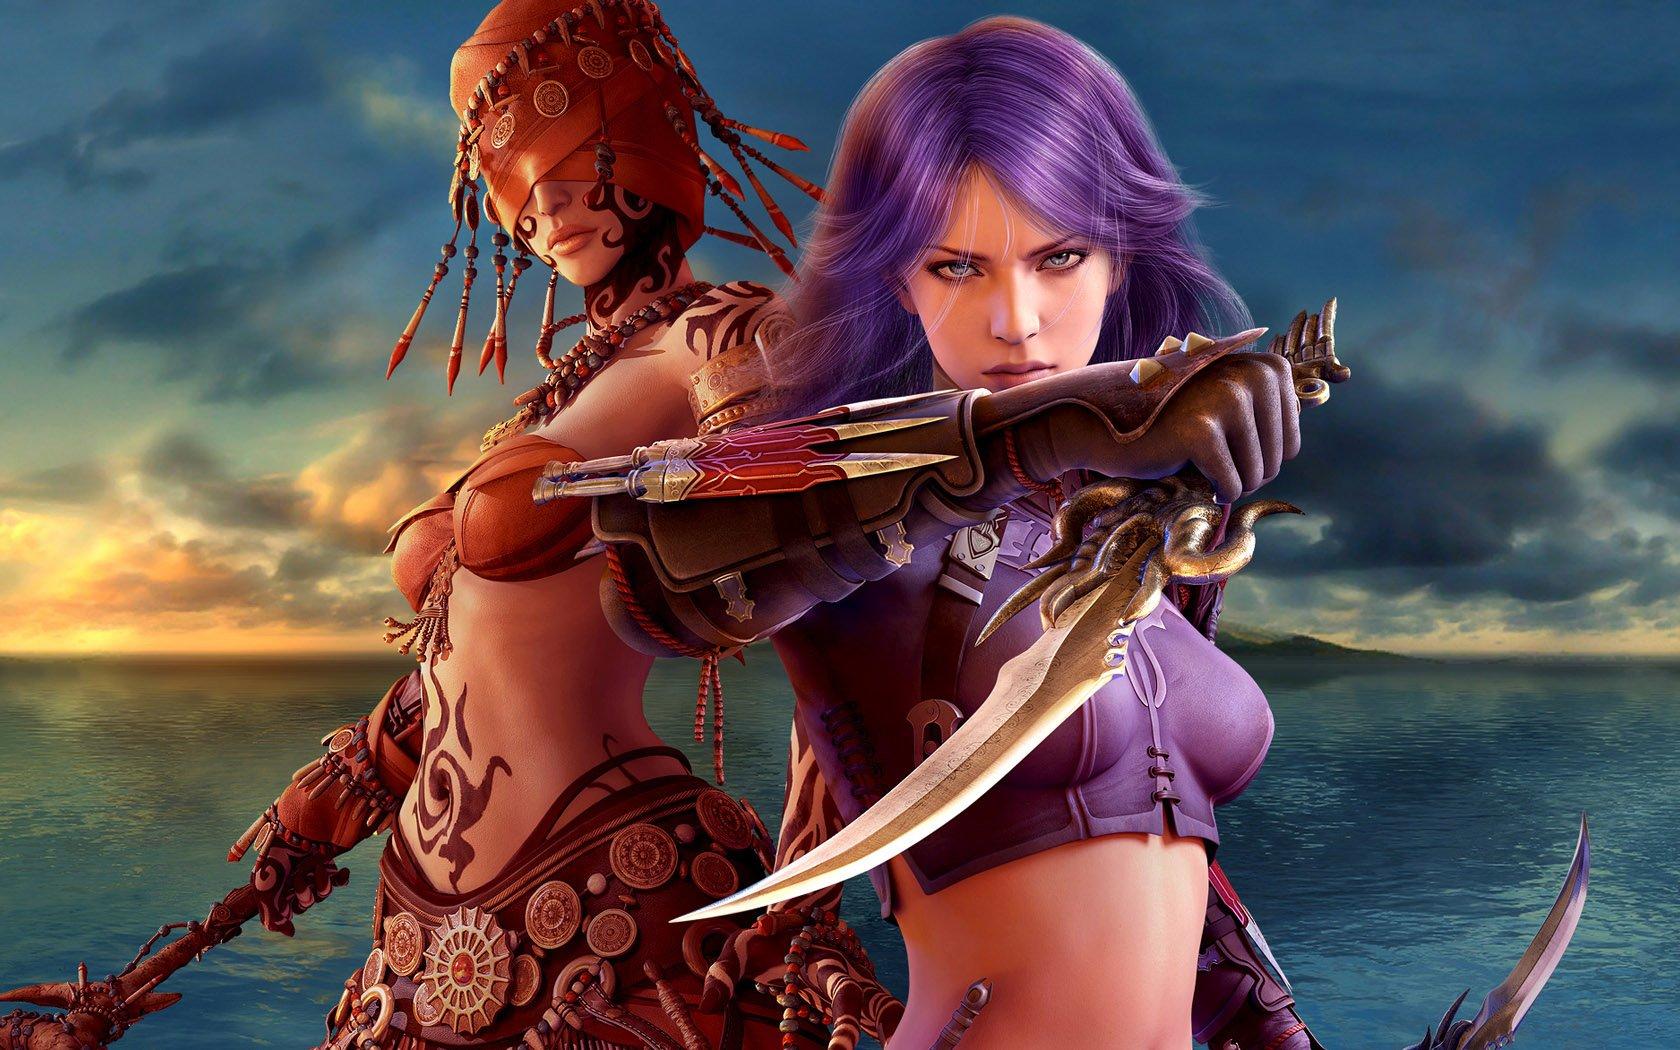 free fantasy warrior women wallpaper - wallpapersafari